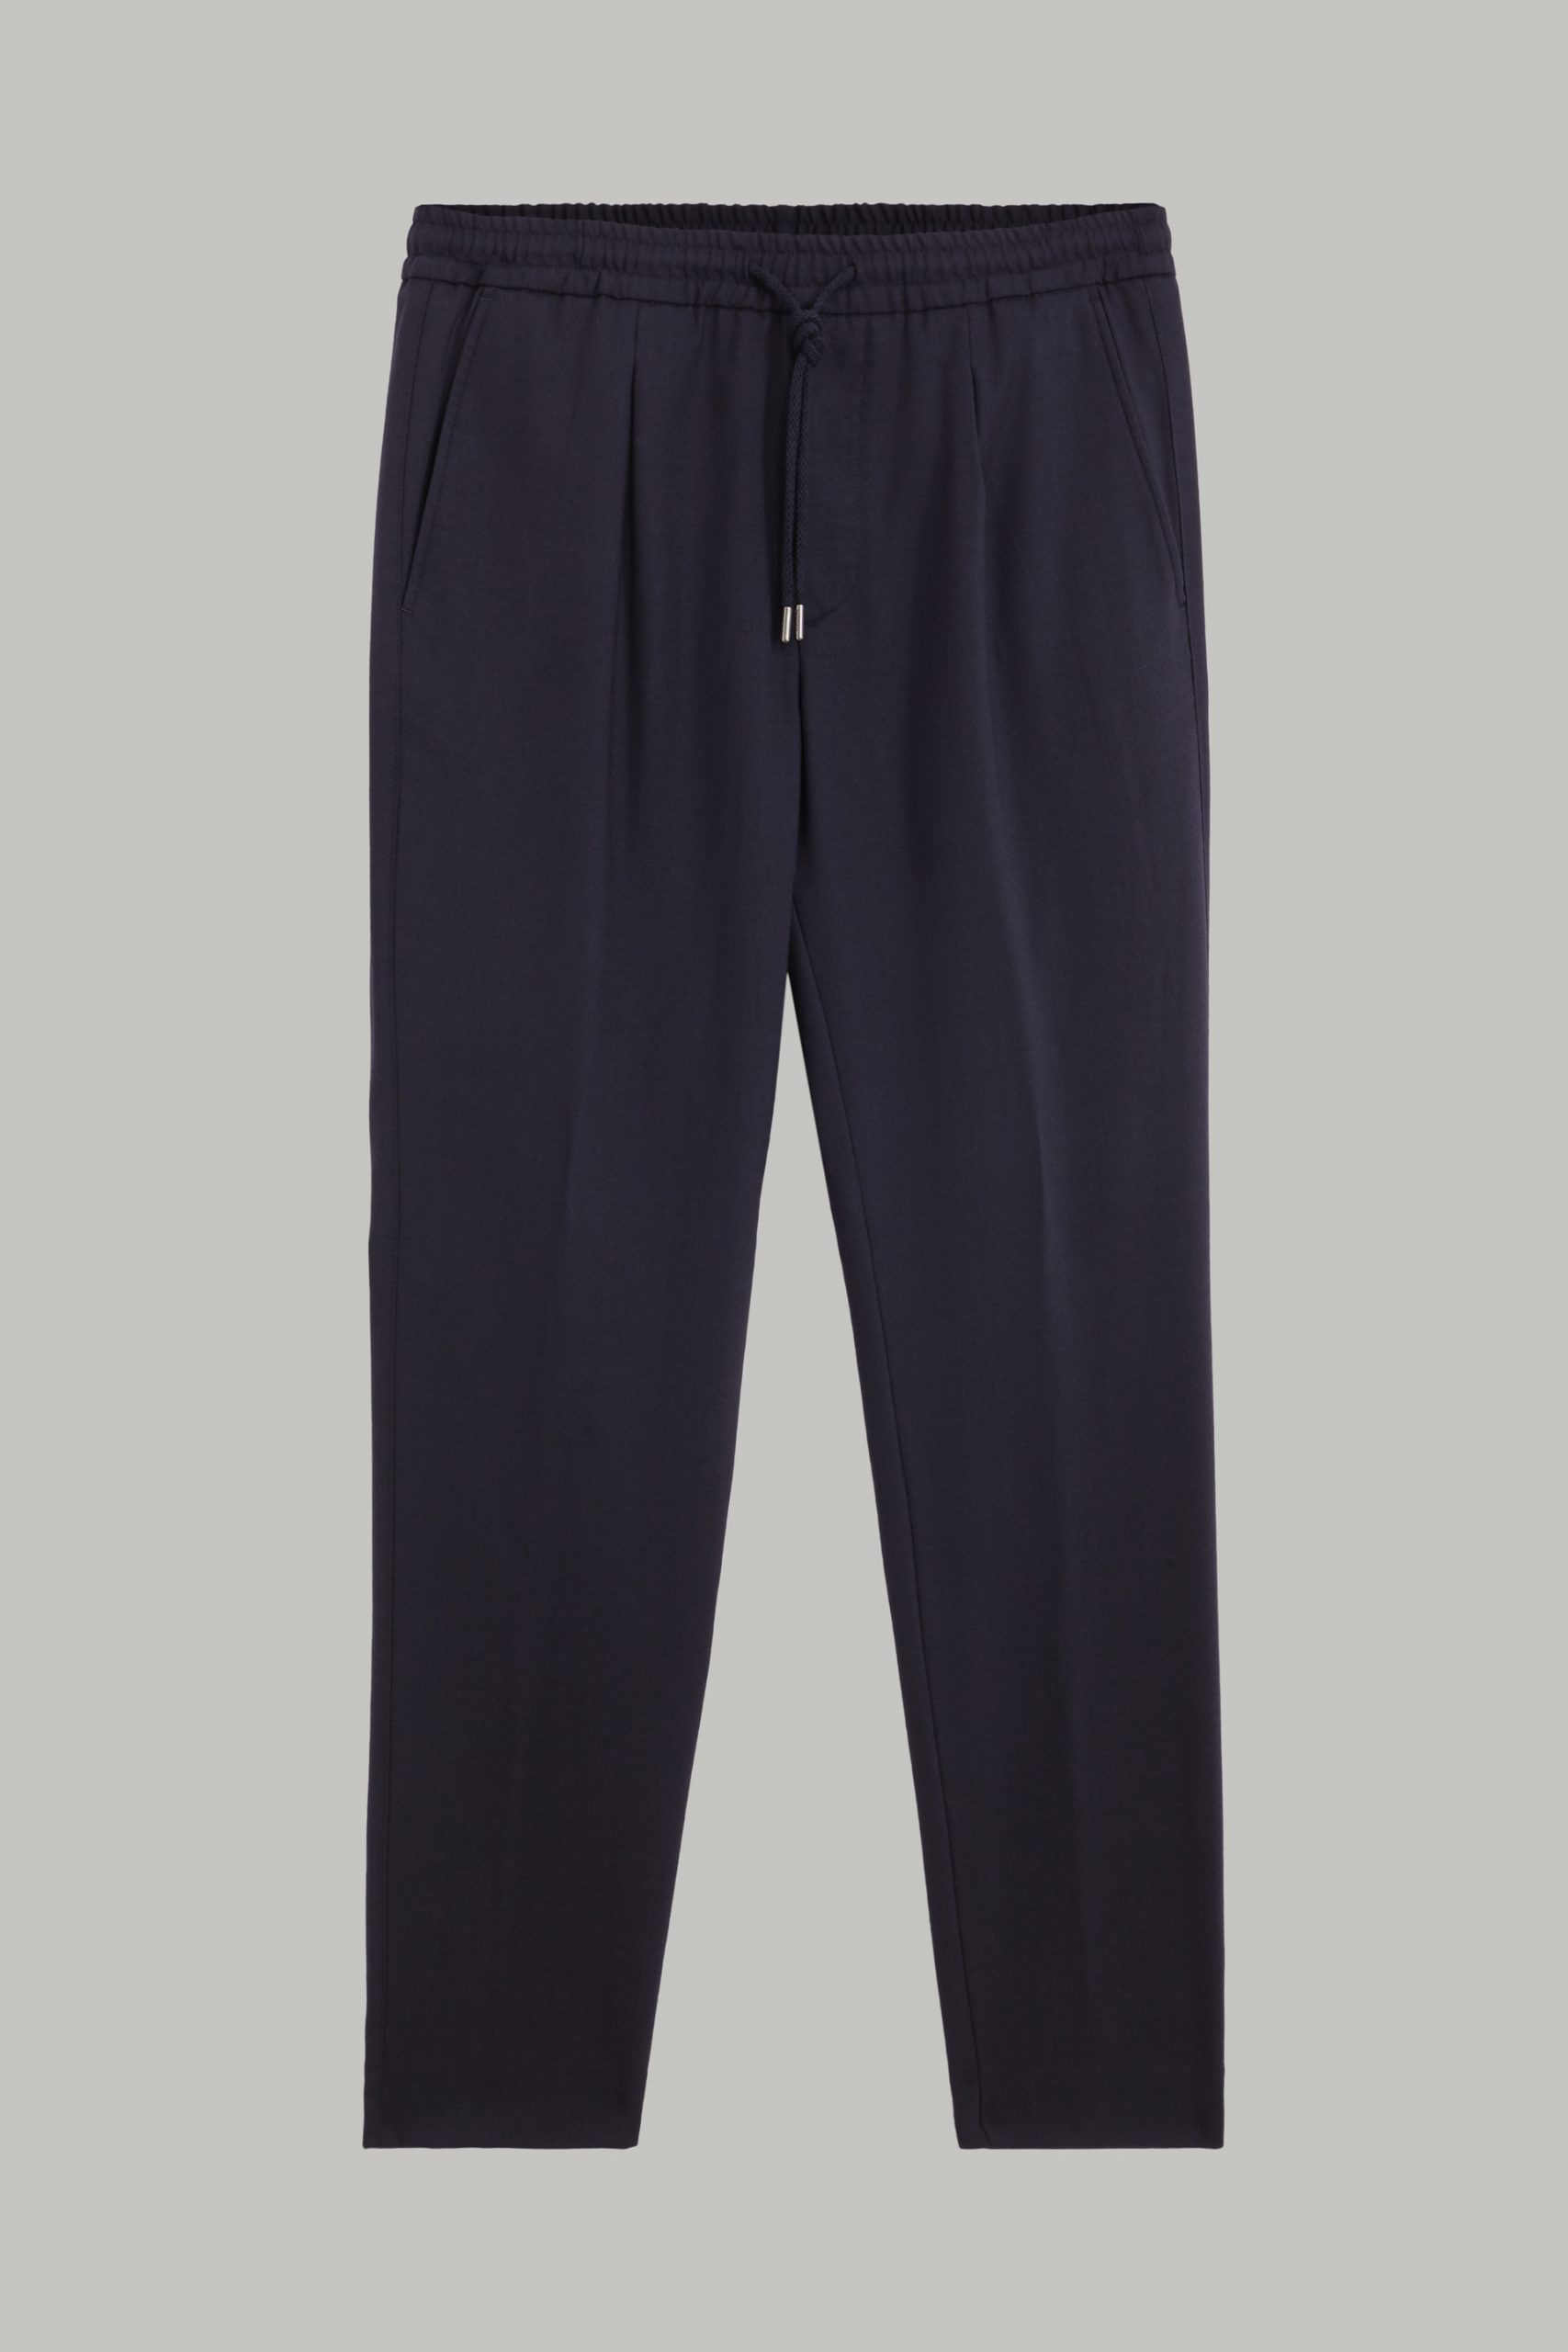 Pantaloni da uomo in colore Navy in materiale